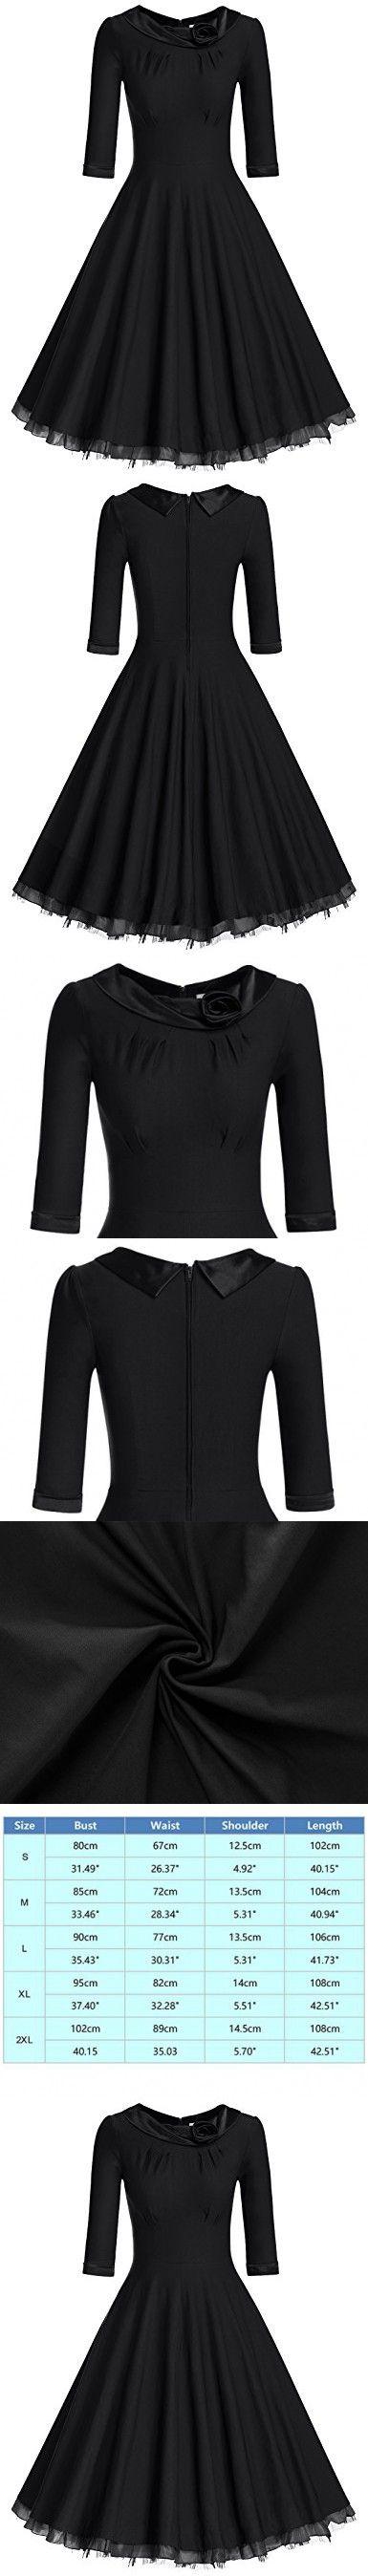 MUXXN Women's Retro-Classic Empire Waist Fall Casual Party Dress (Black,M)